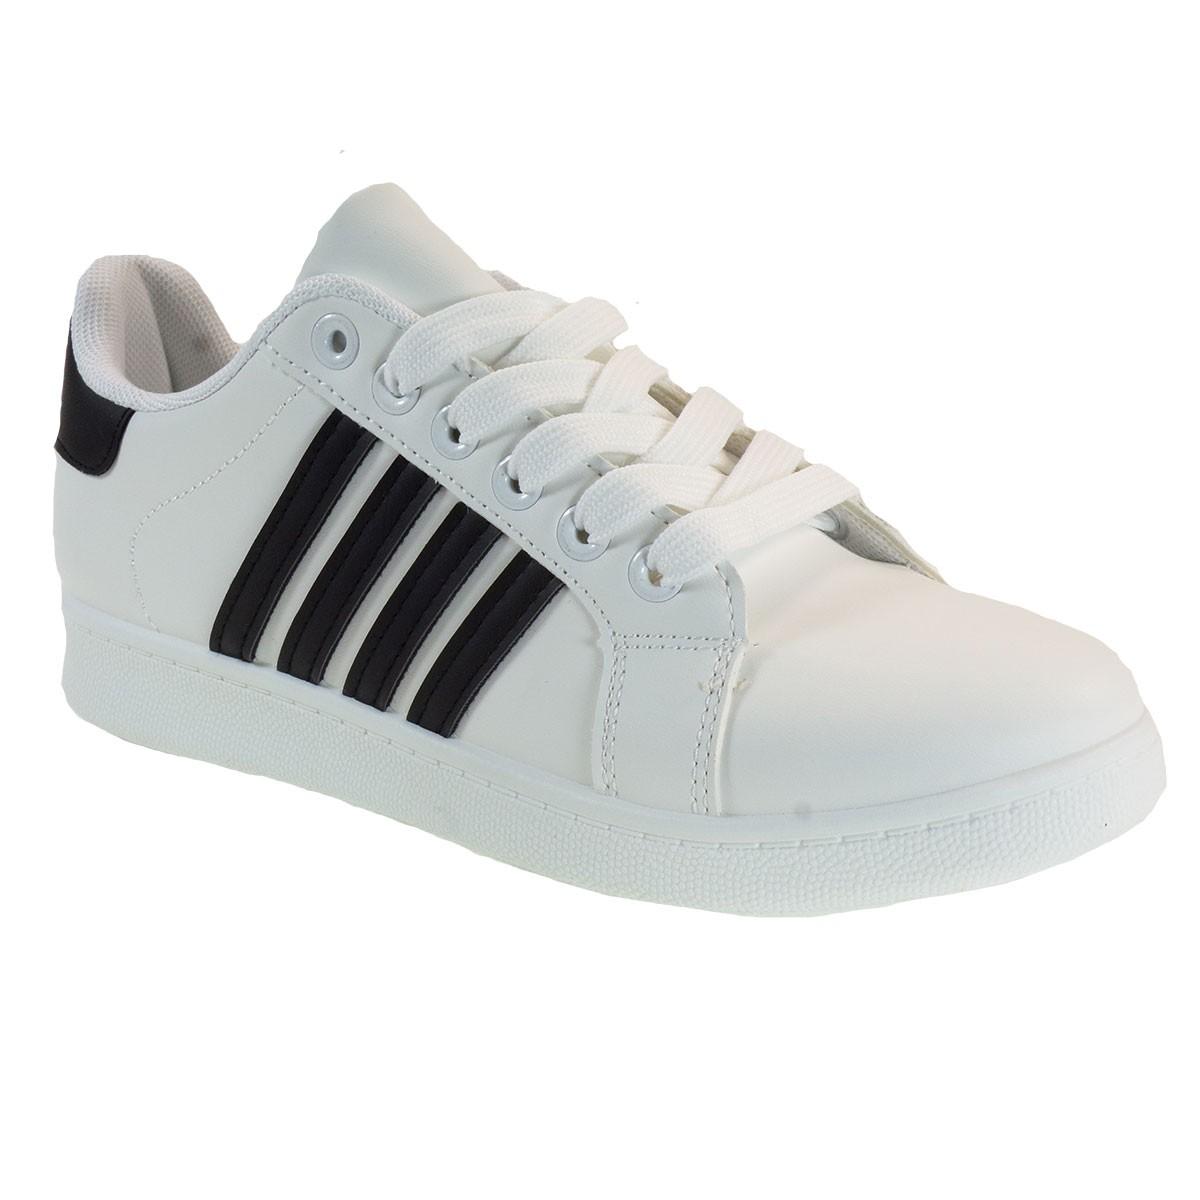 Bagiota Shoes Γυναικεία Παπούτσια Sneakers Αθλητικά MG105 Λευκό-Μαύρο